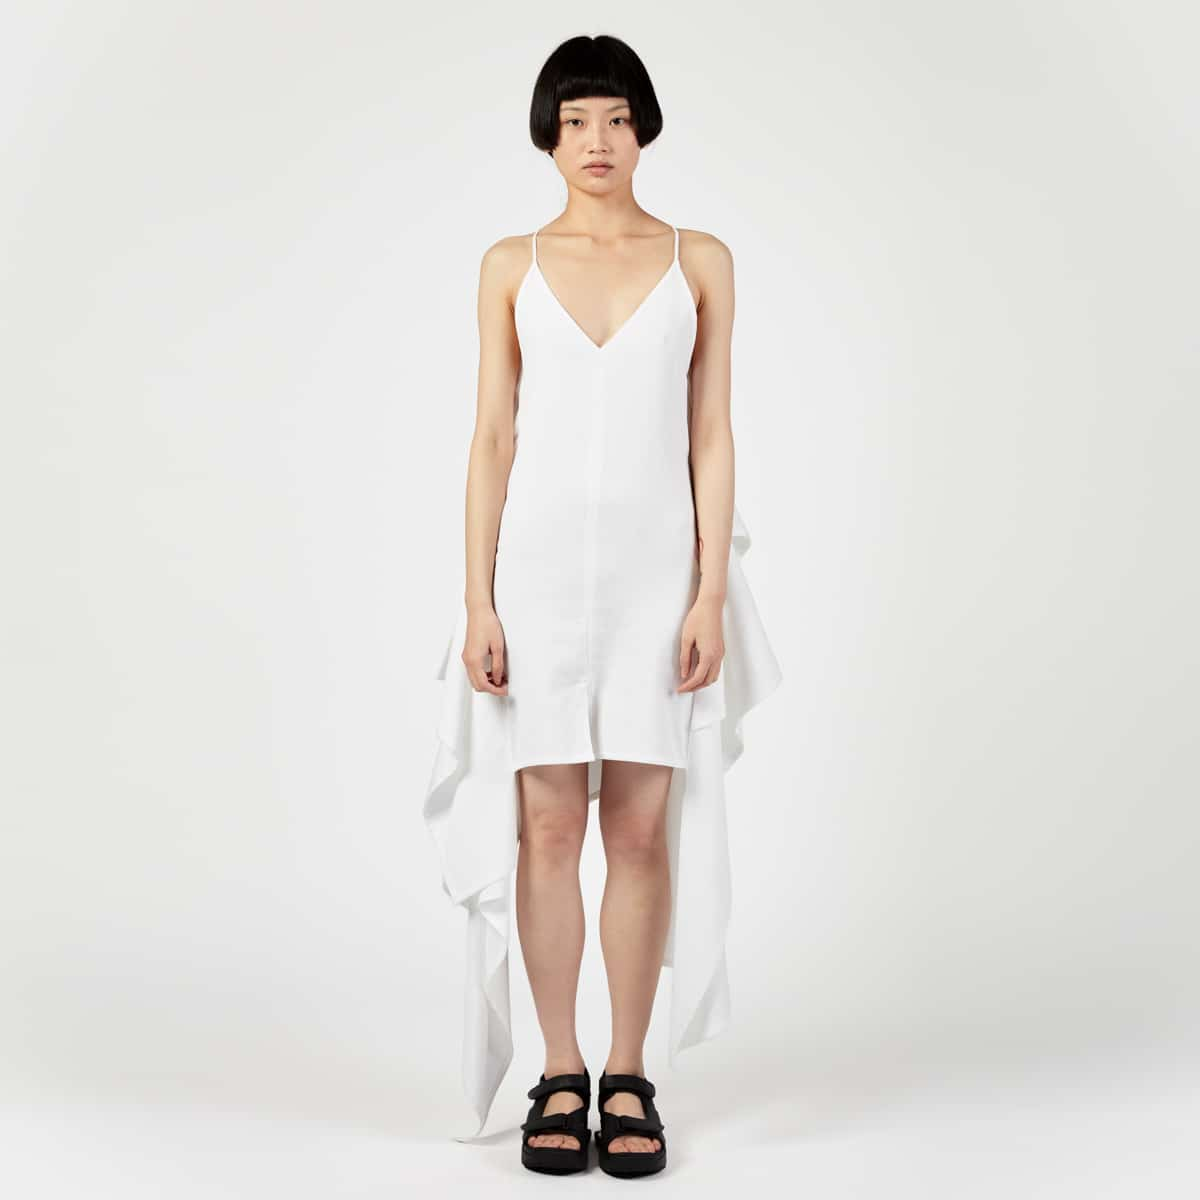 AFTERHOMEWORK (PARIS) Square Dress